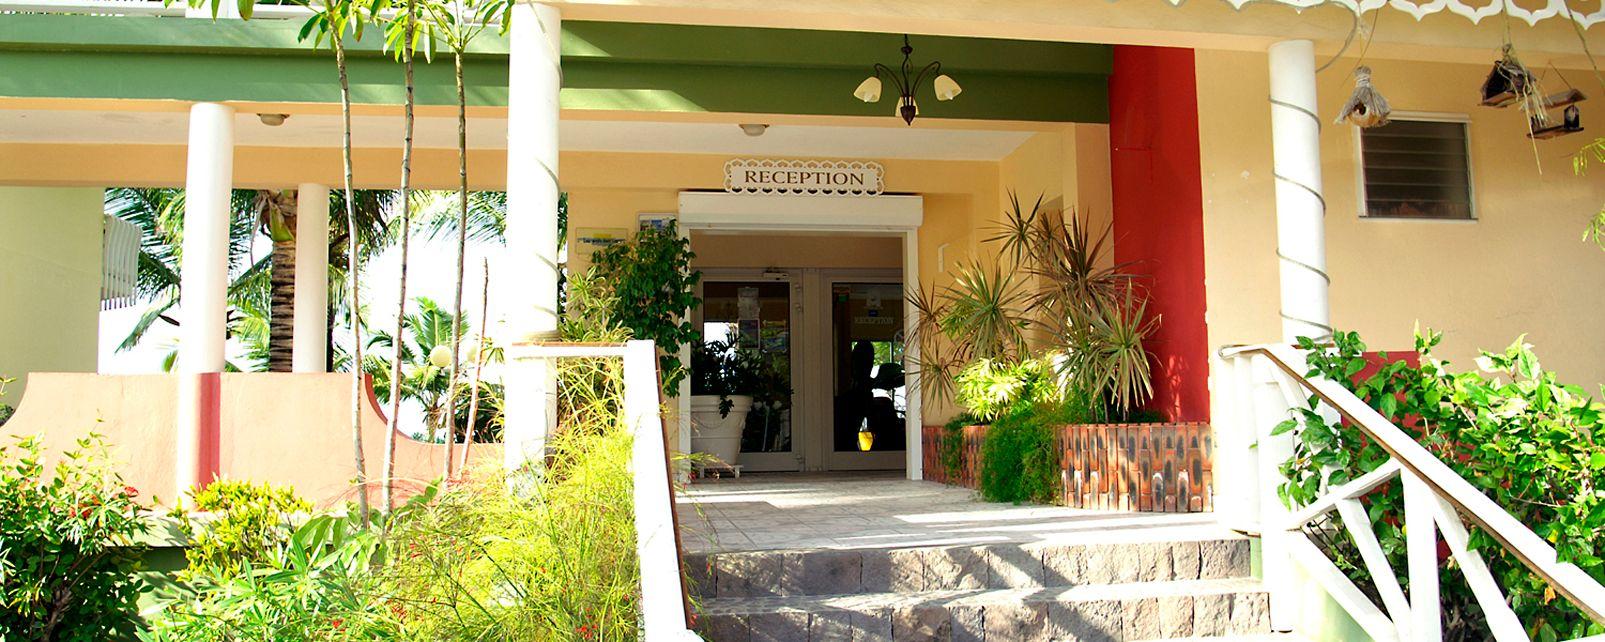 Hotel Saint-Barth's Beach Hotel